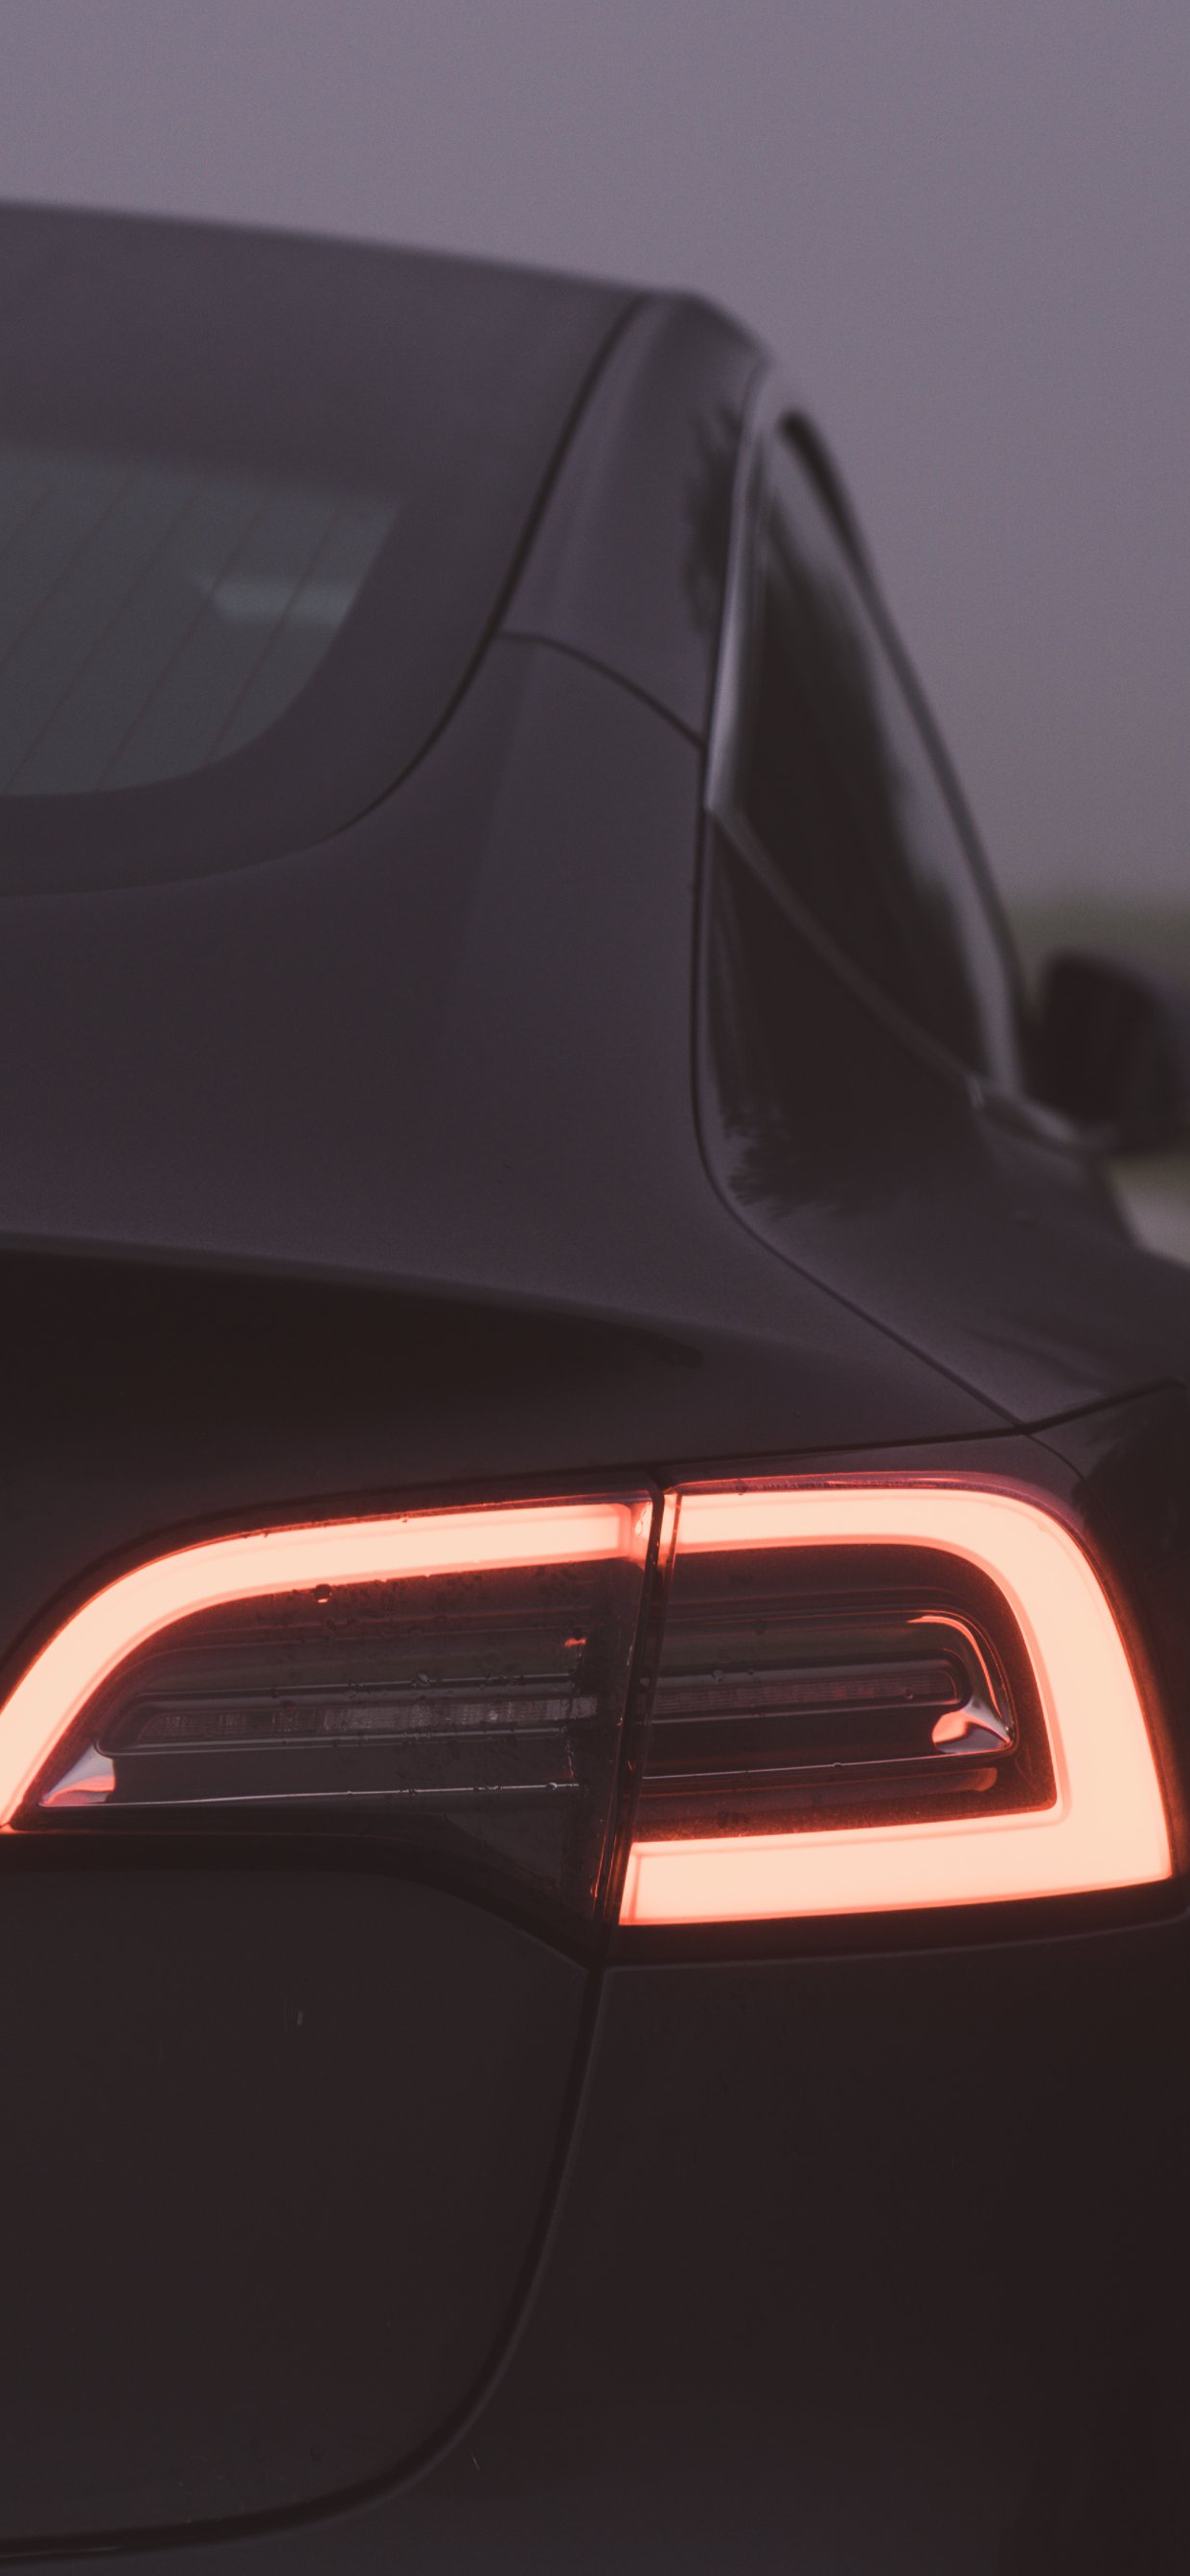 Tesla Model 3 Iphone Wallpapers